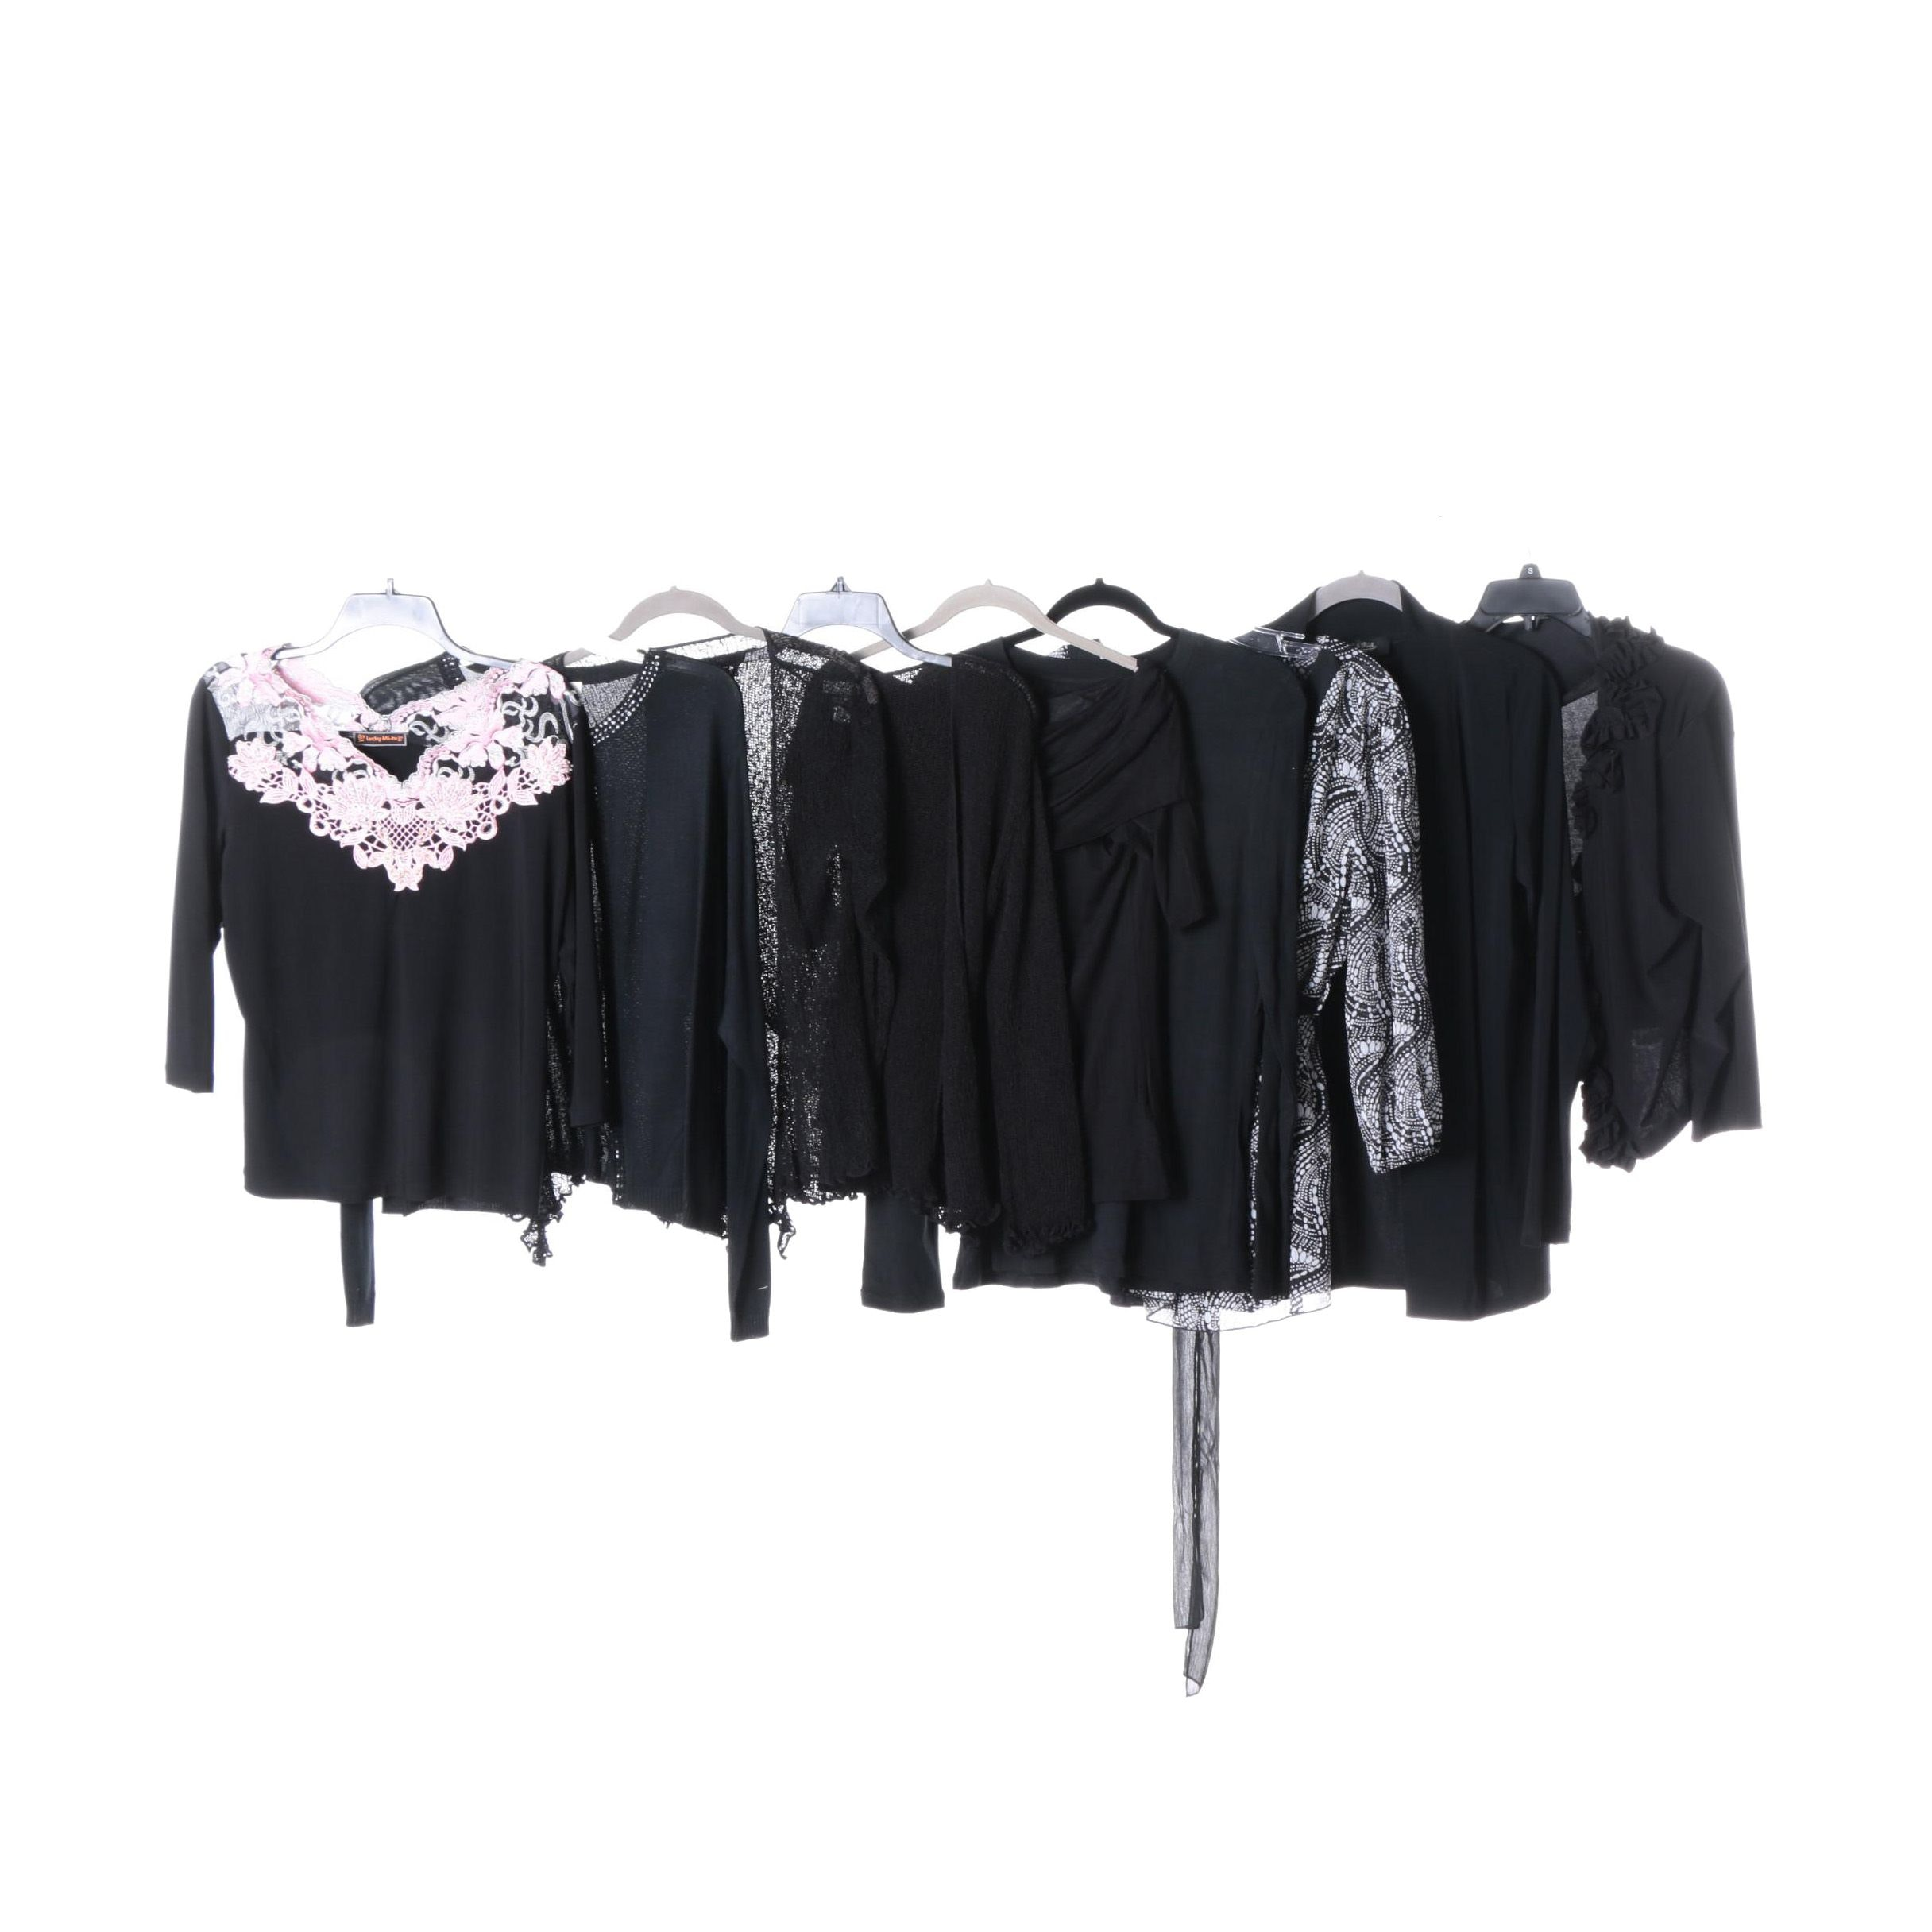 Women's Tops Separates in Black